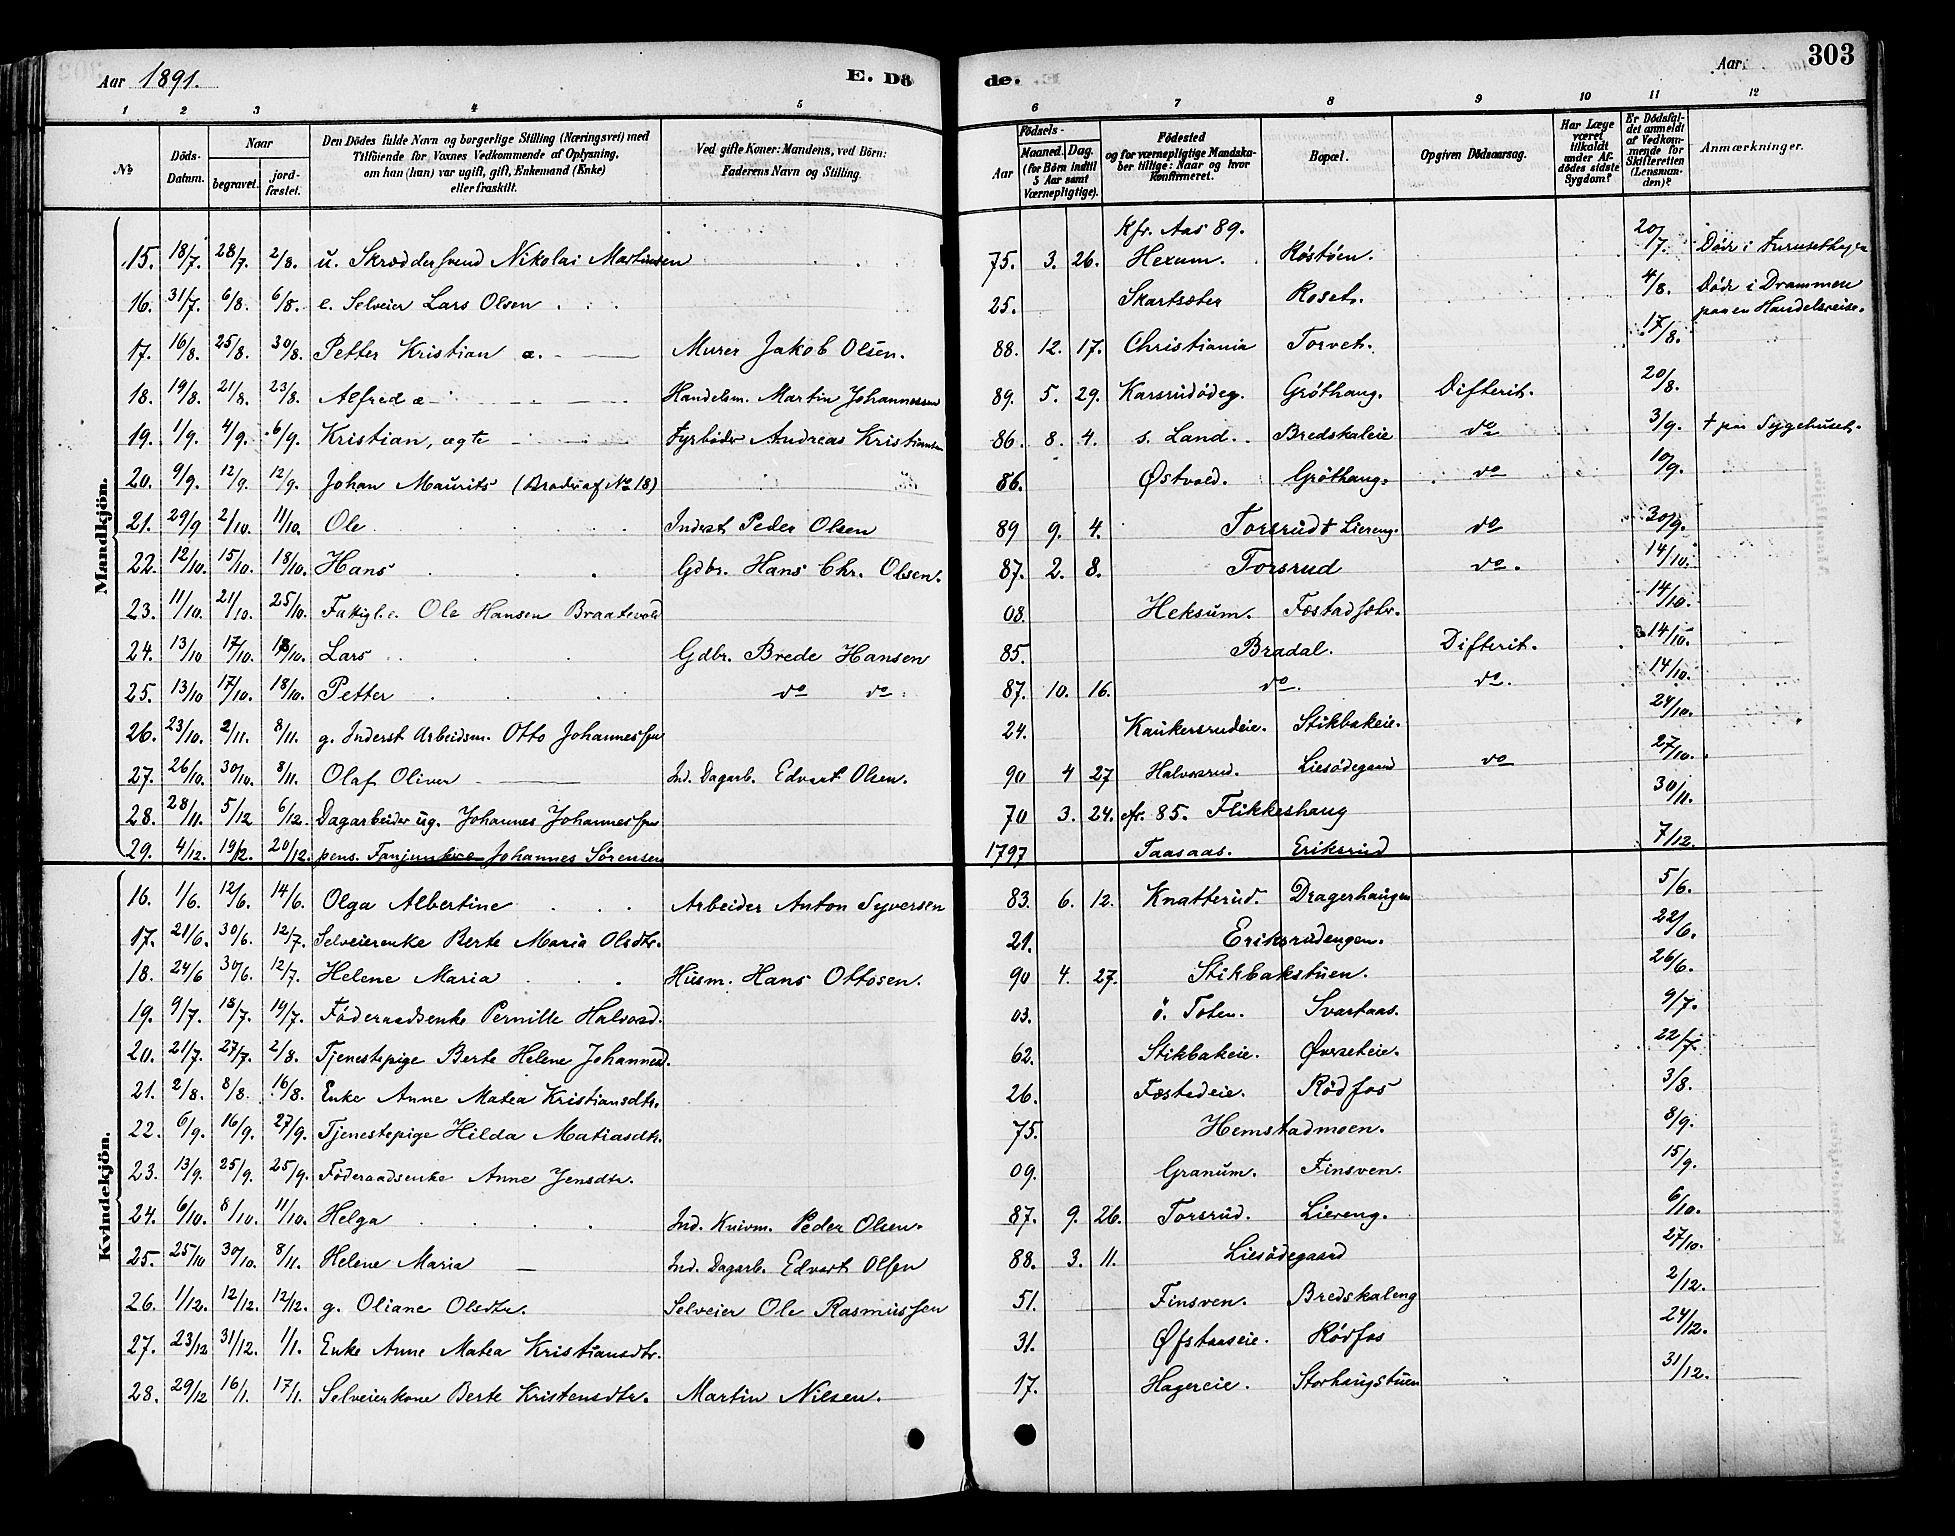 SAH, Vestre Toten prestekontor, H/Ha/Haa/L0009: Ministerialbok nr. 9, 1878-1894, s. 303